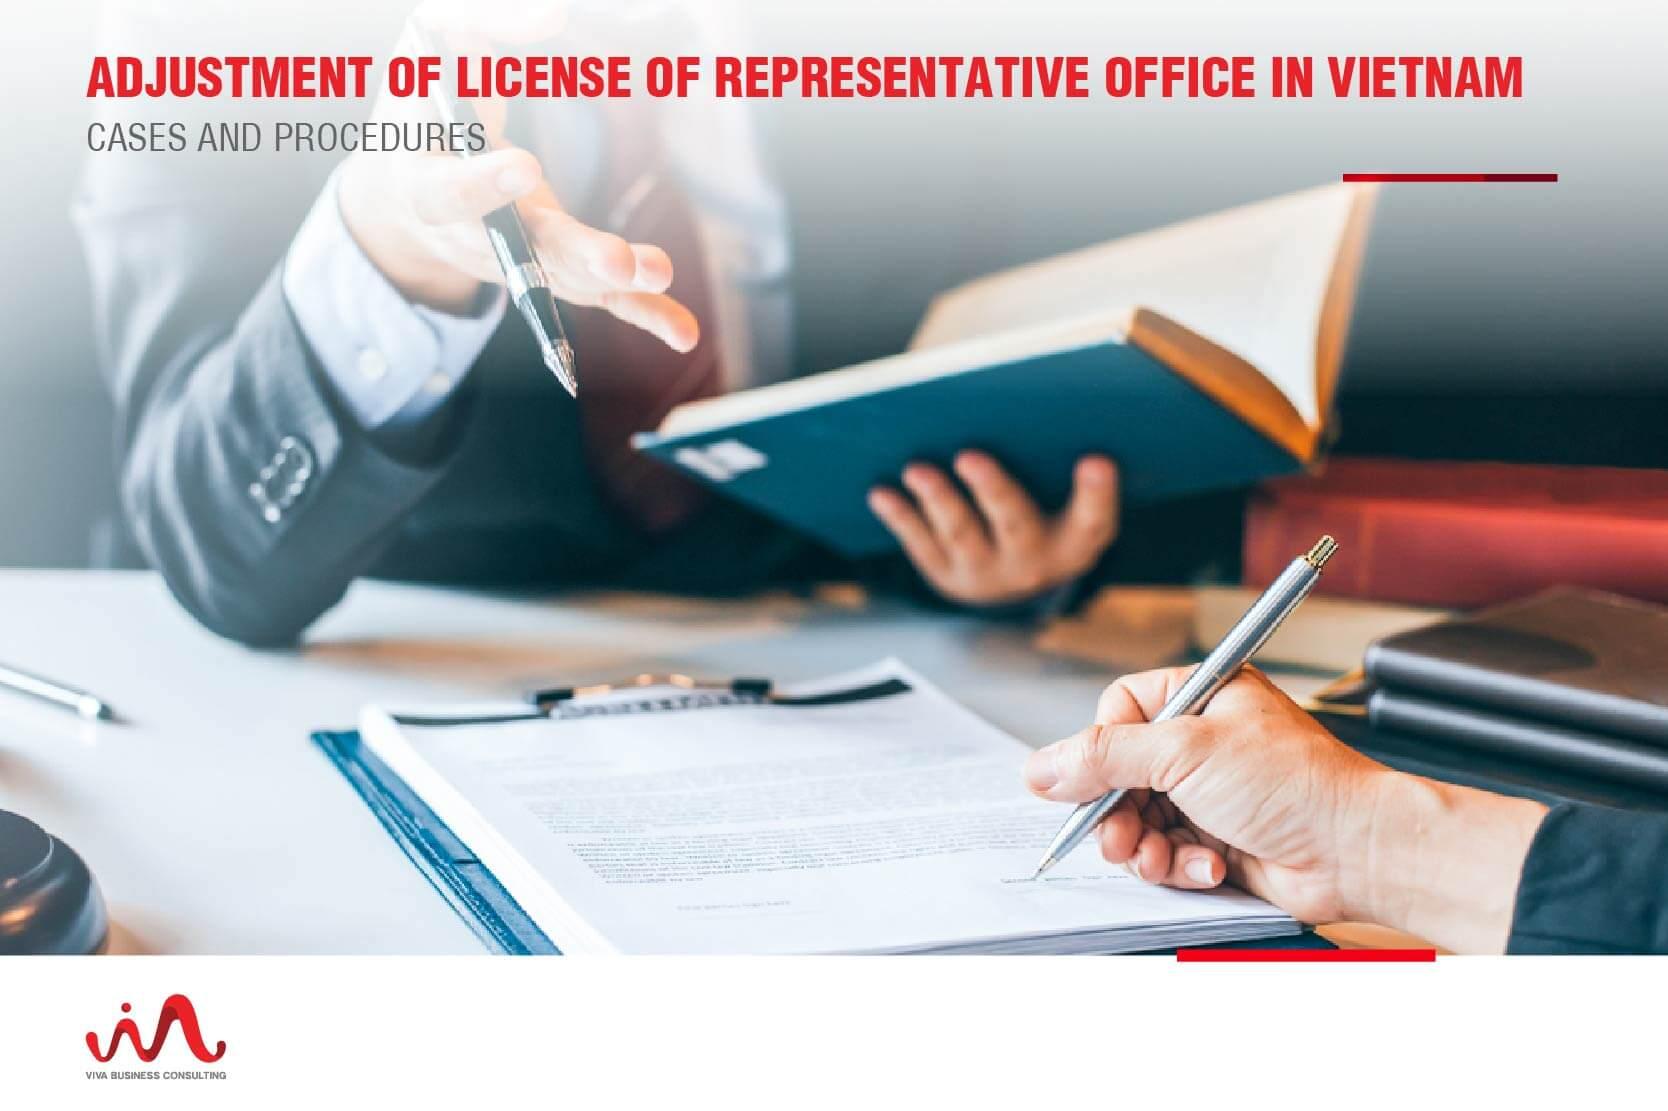 Adjustment of license of representative office in Vietnam